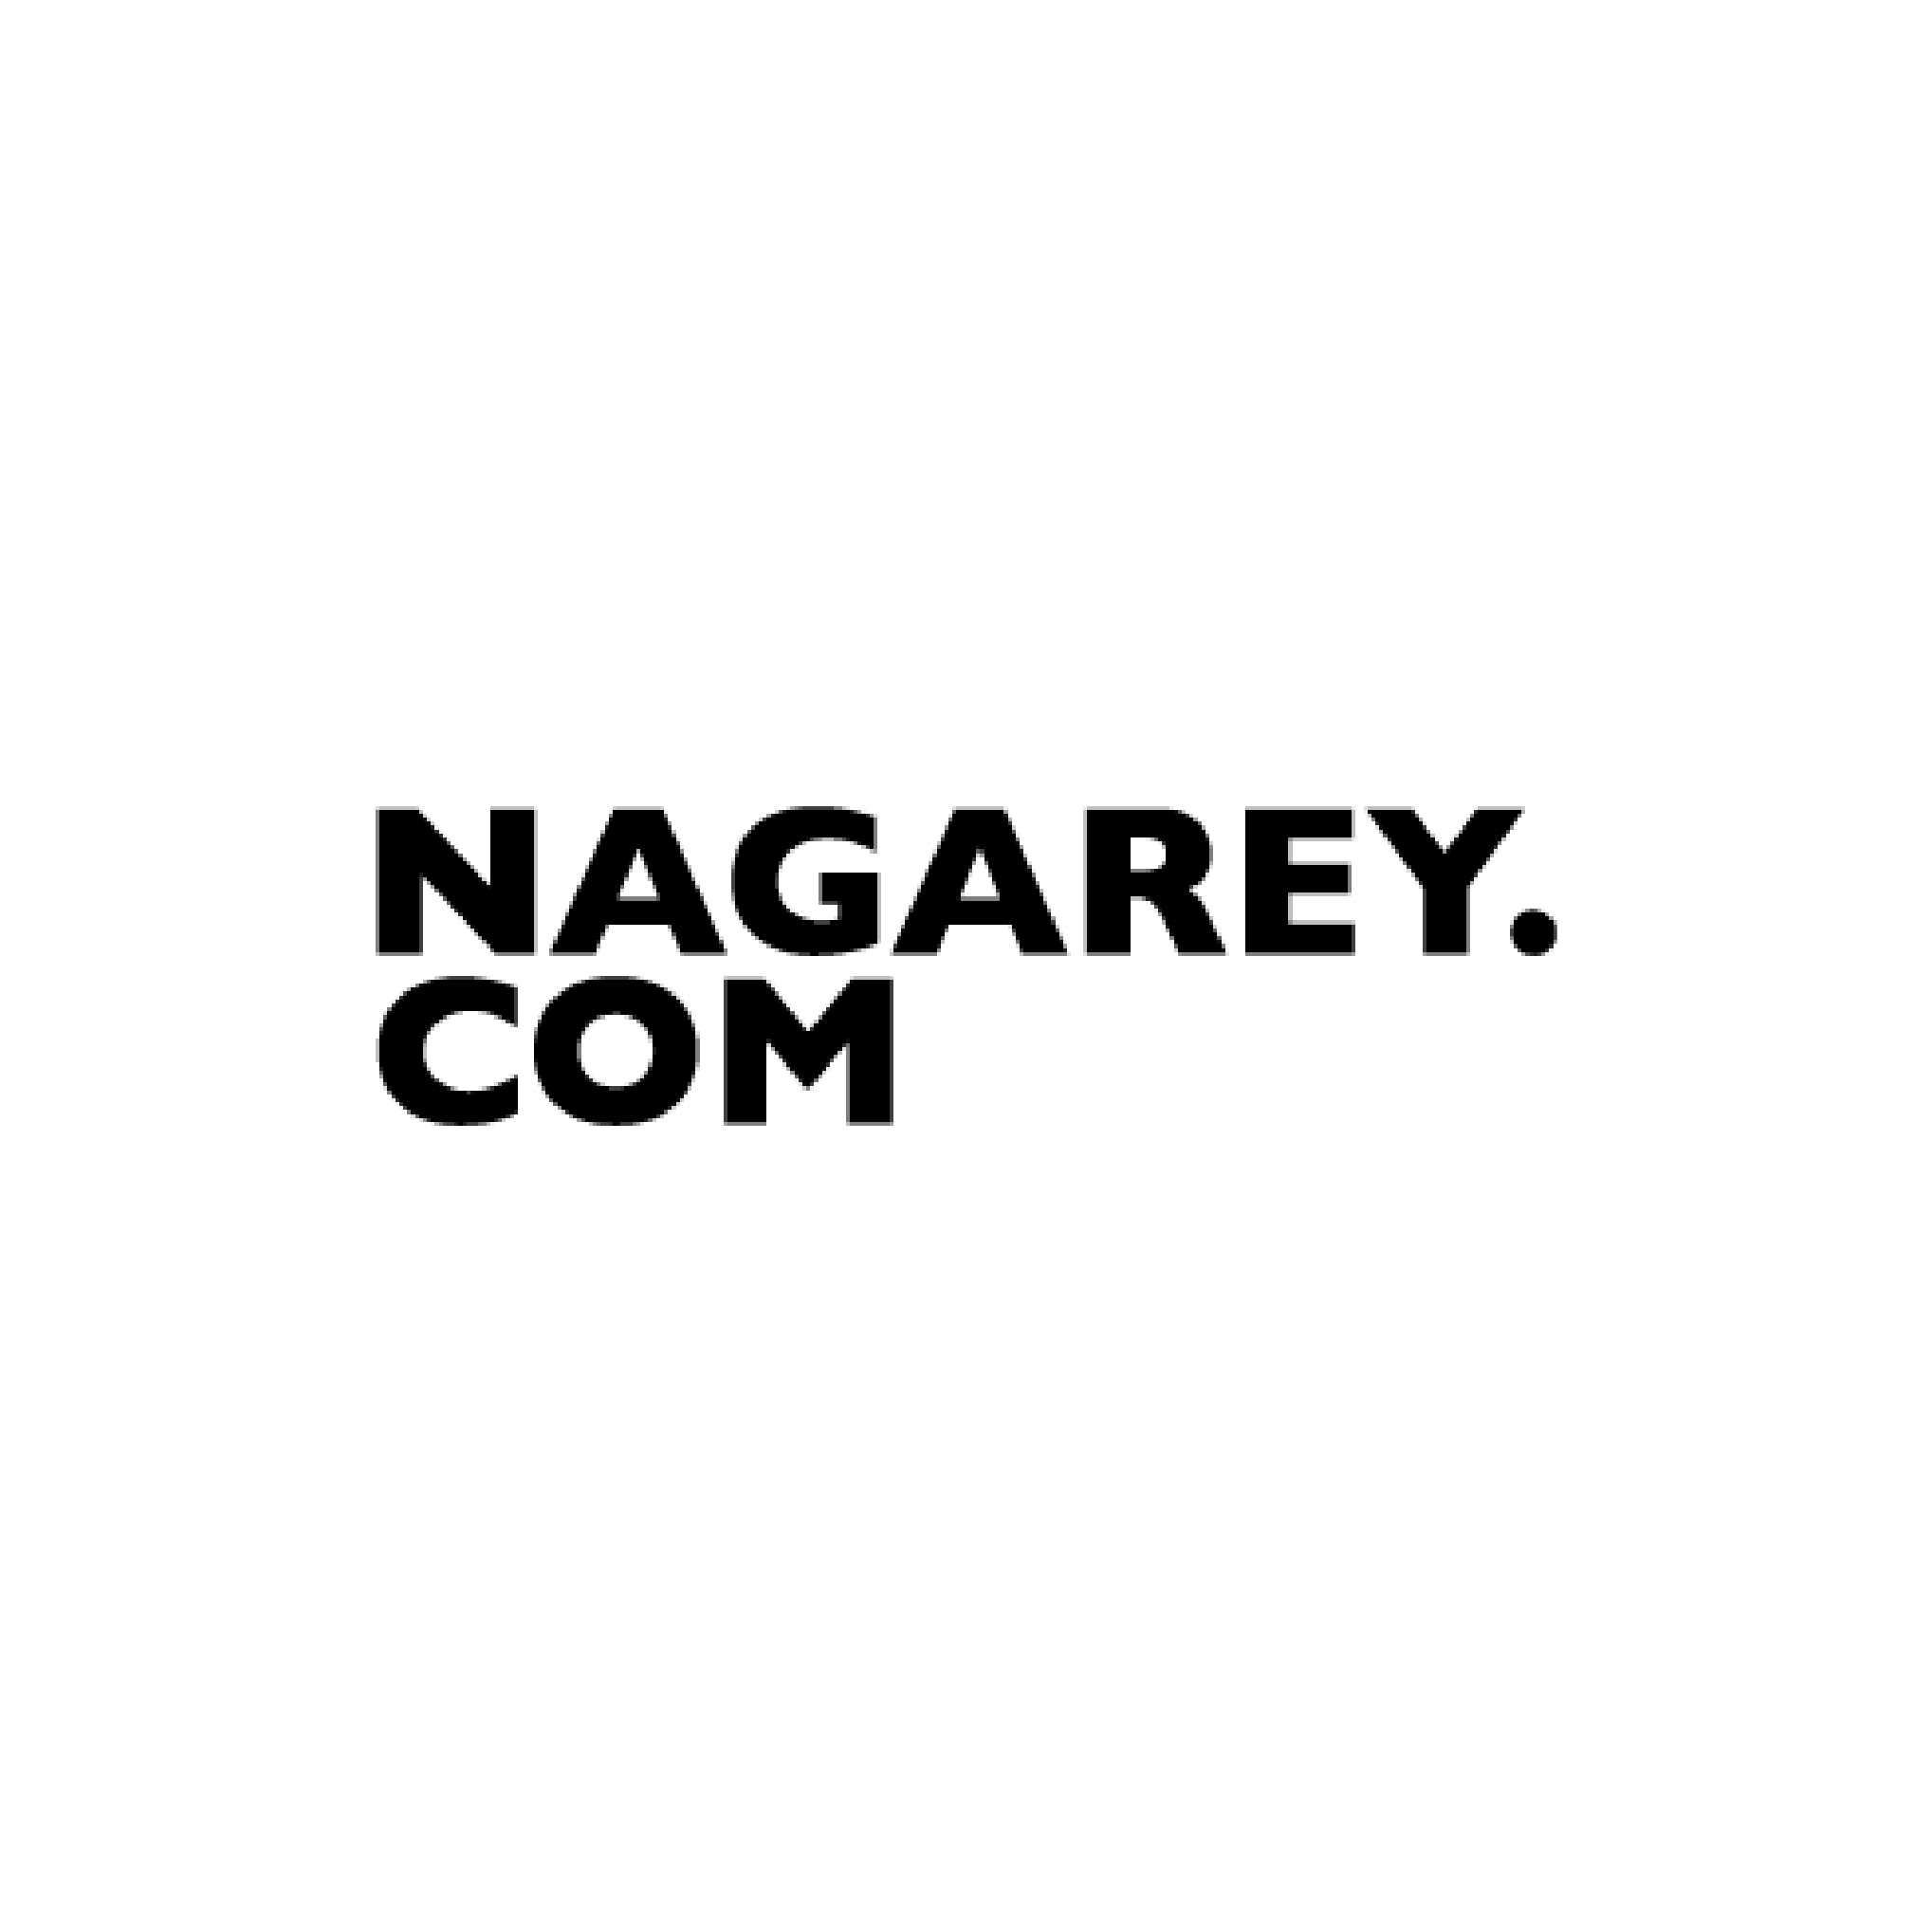 Nagarey